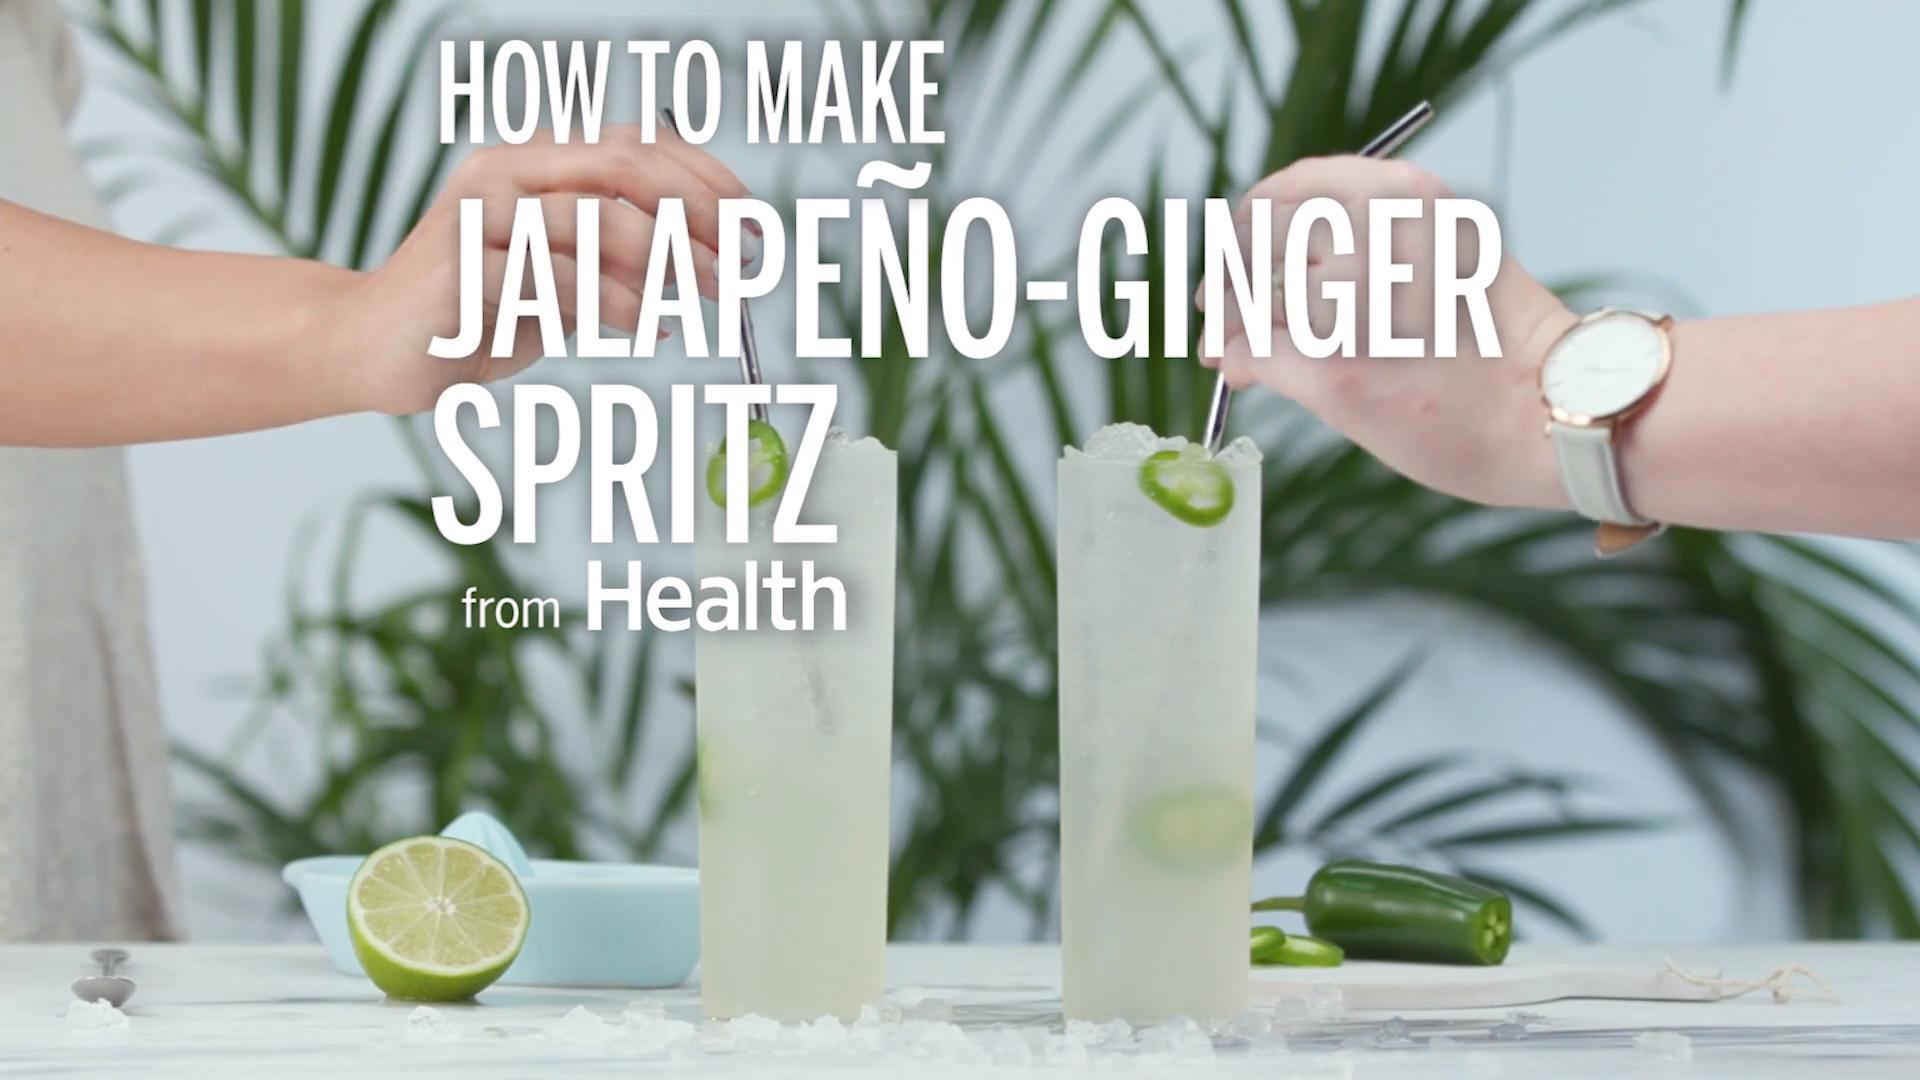 Jalapeño-Ginger Spritz